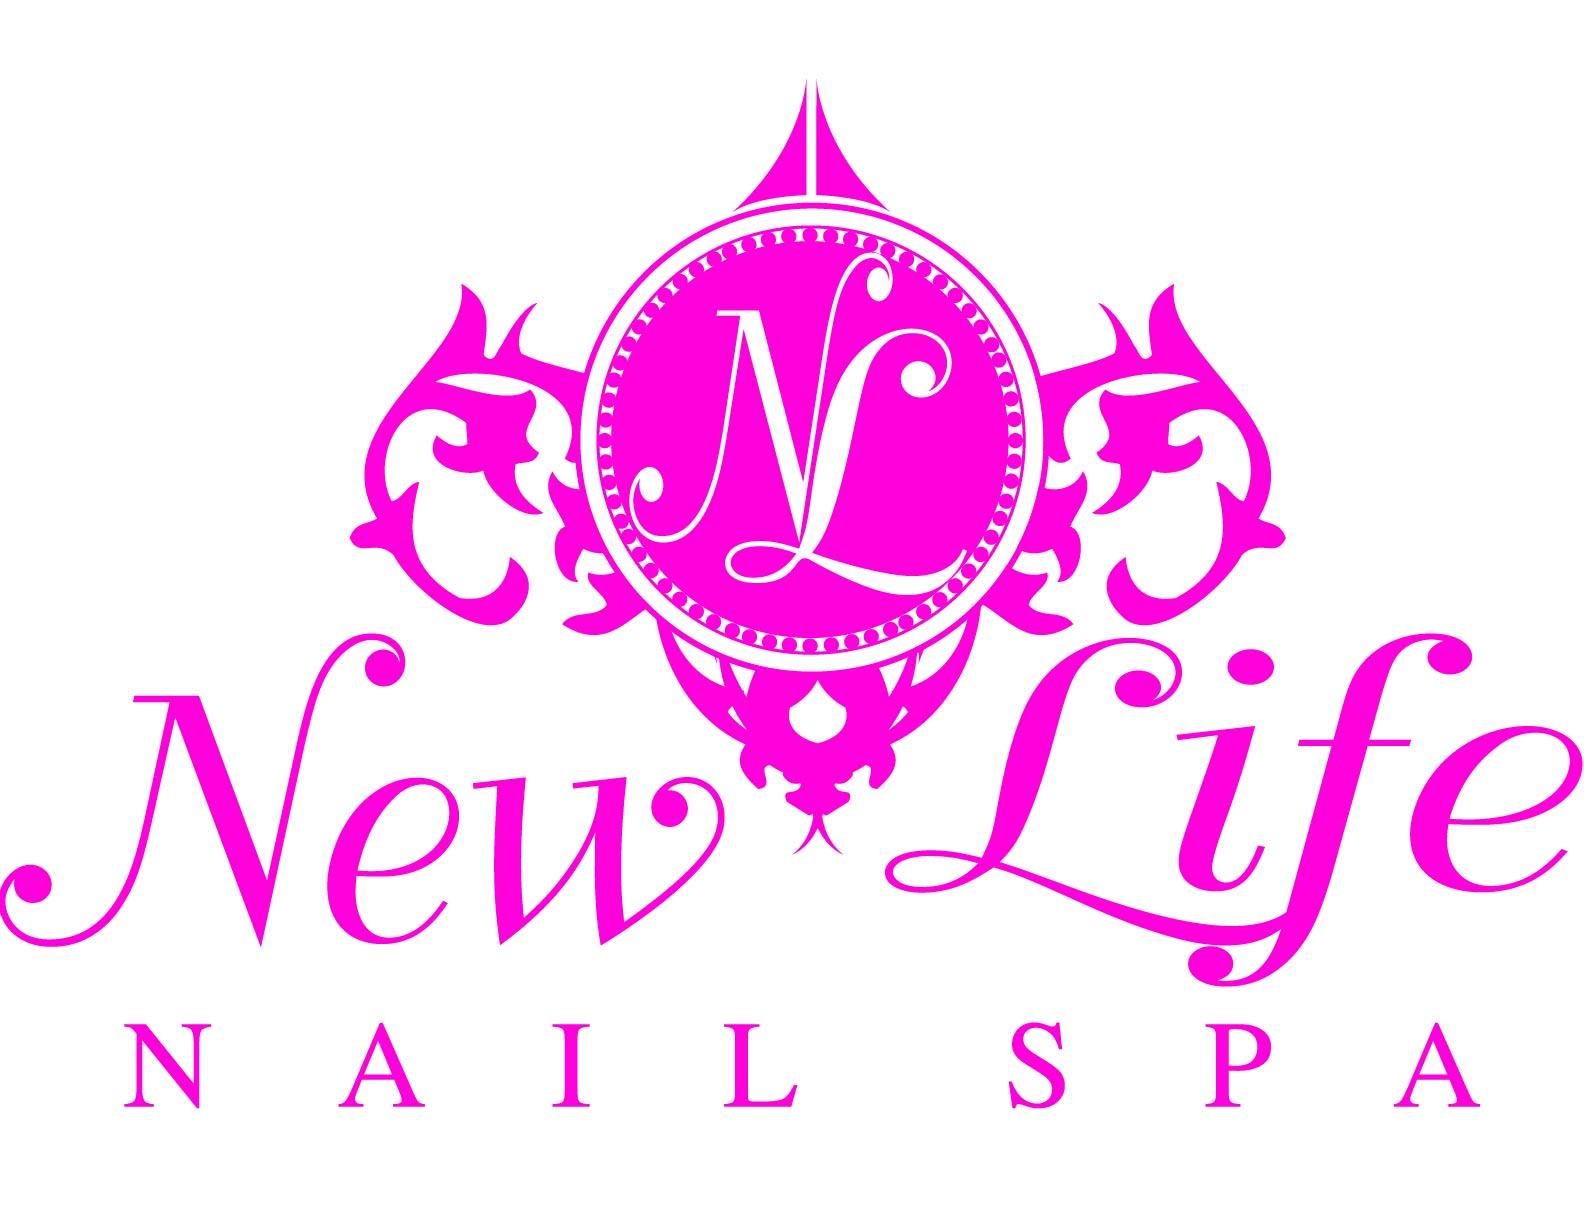 NewlifenailSpa LogoArtboard 1@2x-50.jpg